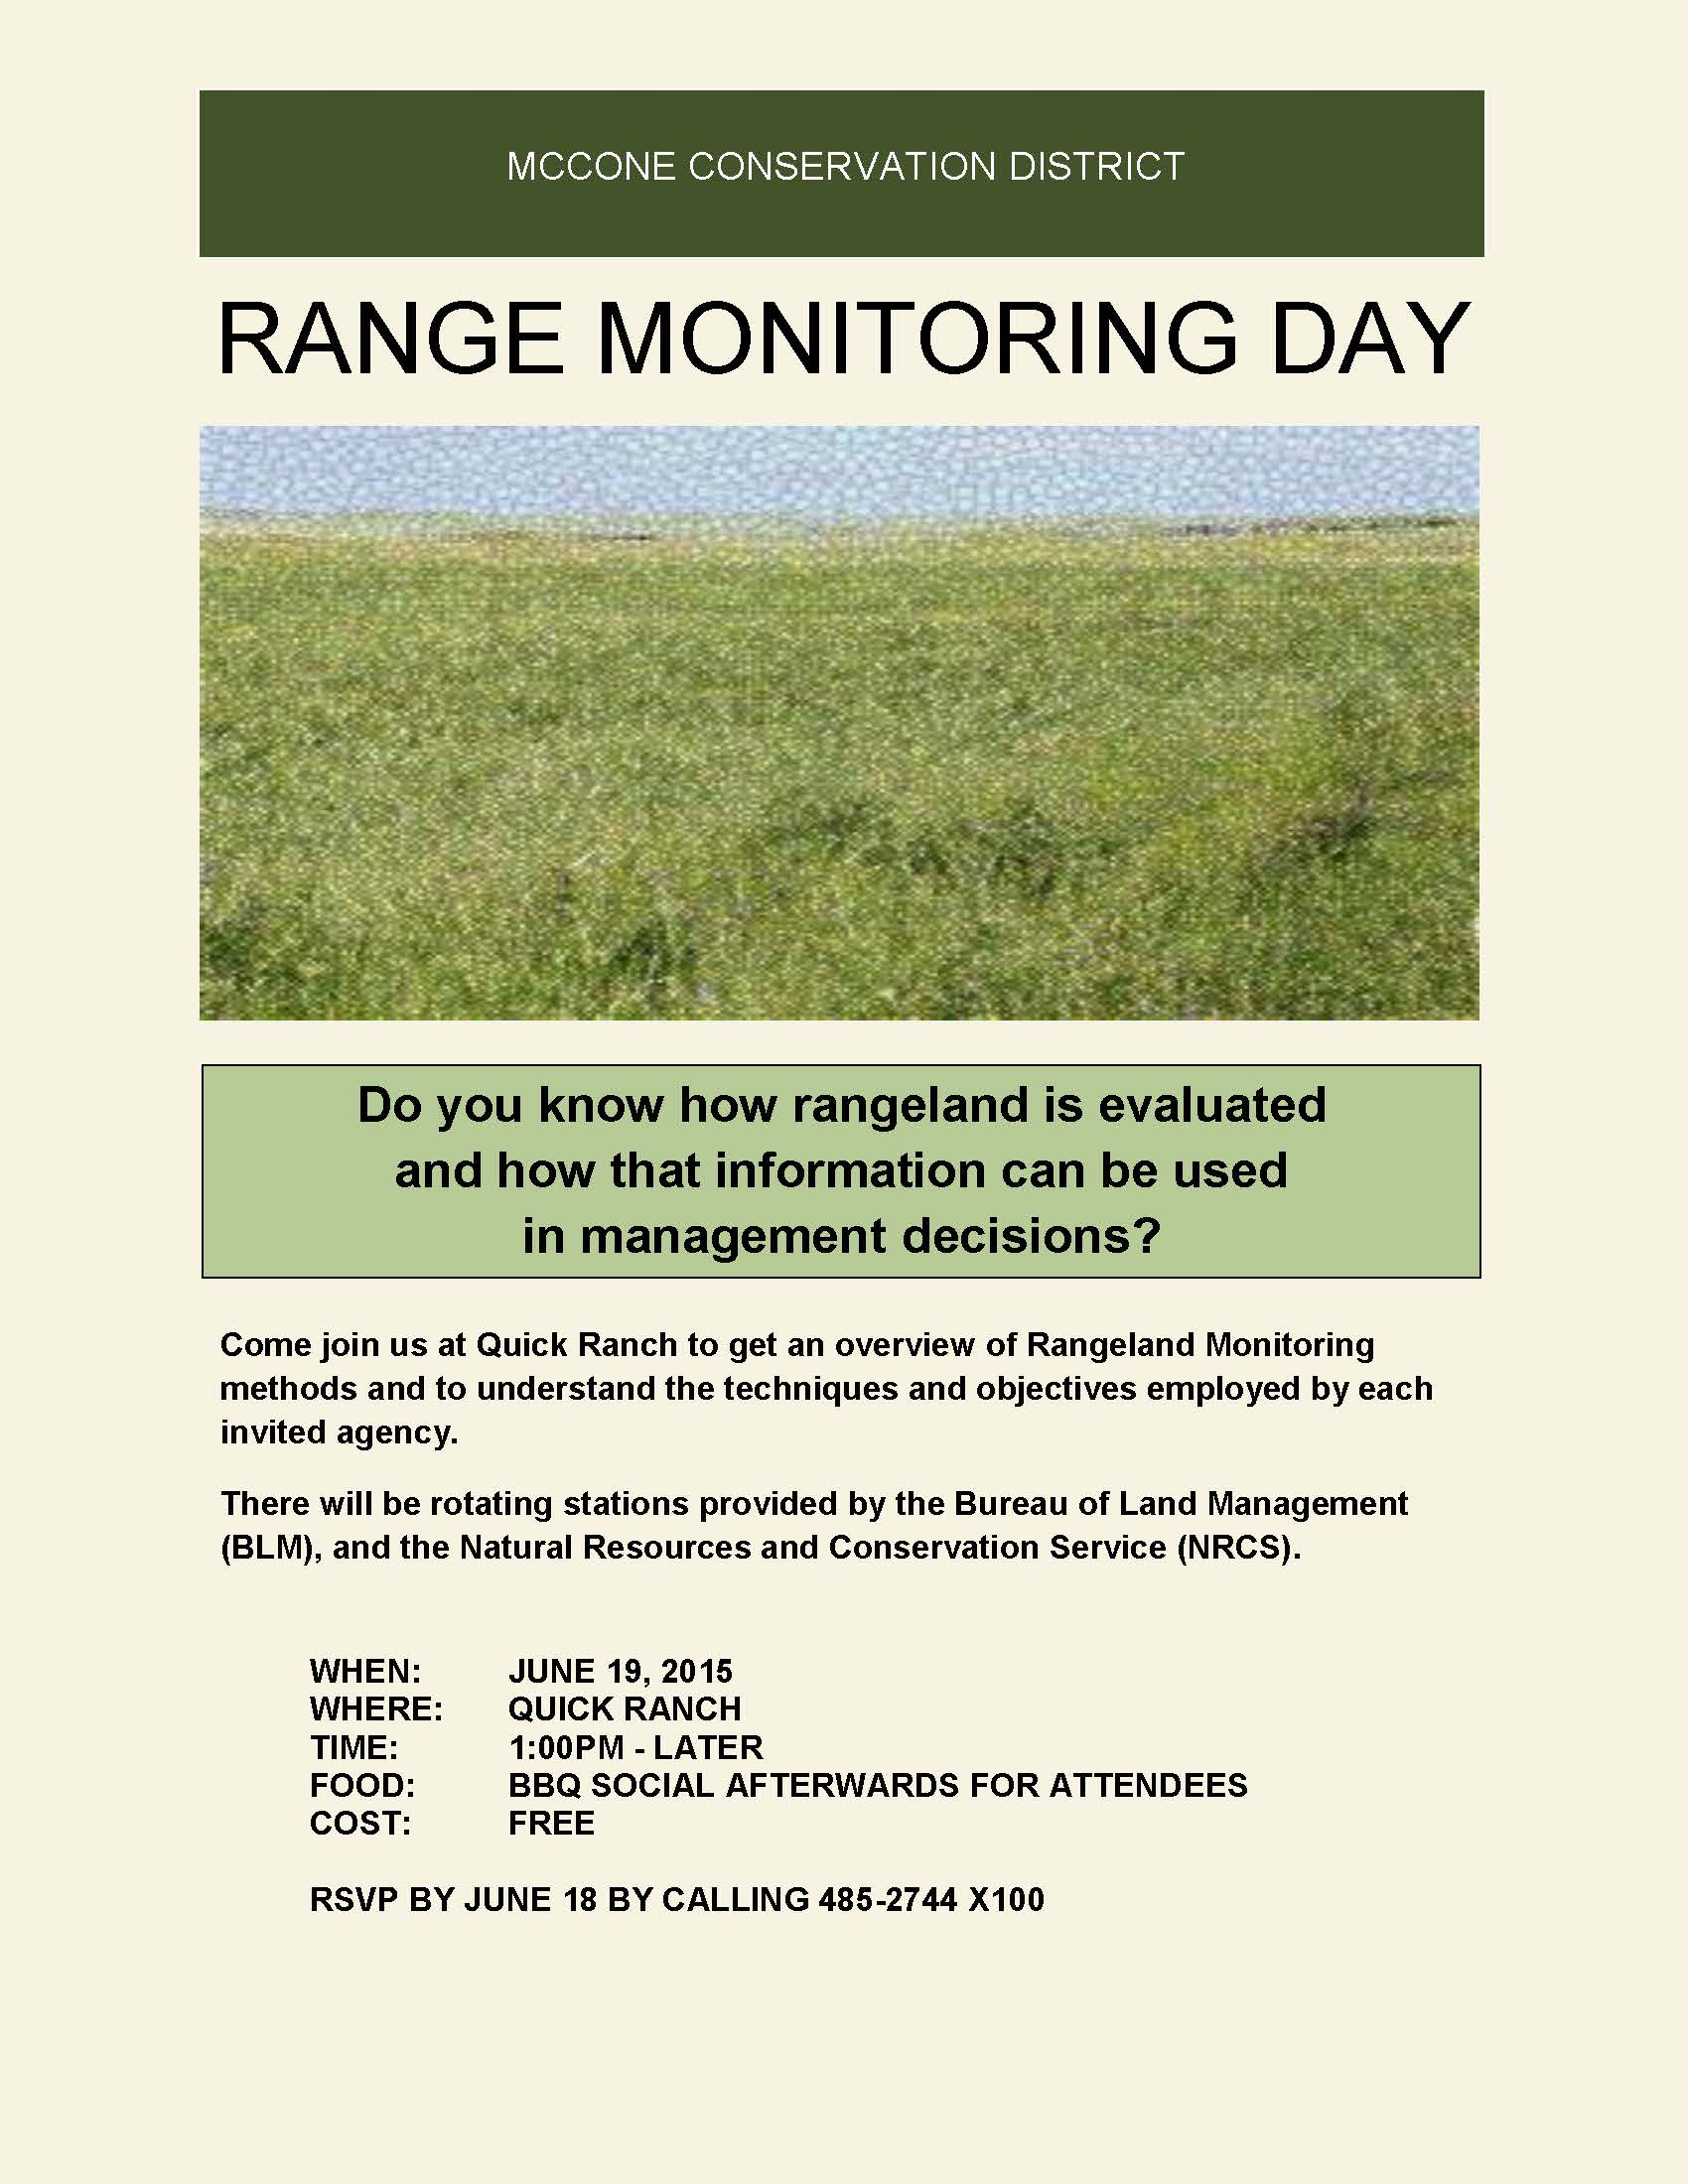 Montana mccone county brockway - Range Monitoring Day2